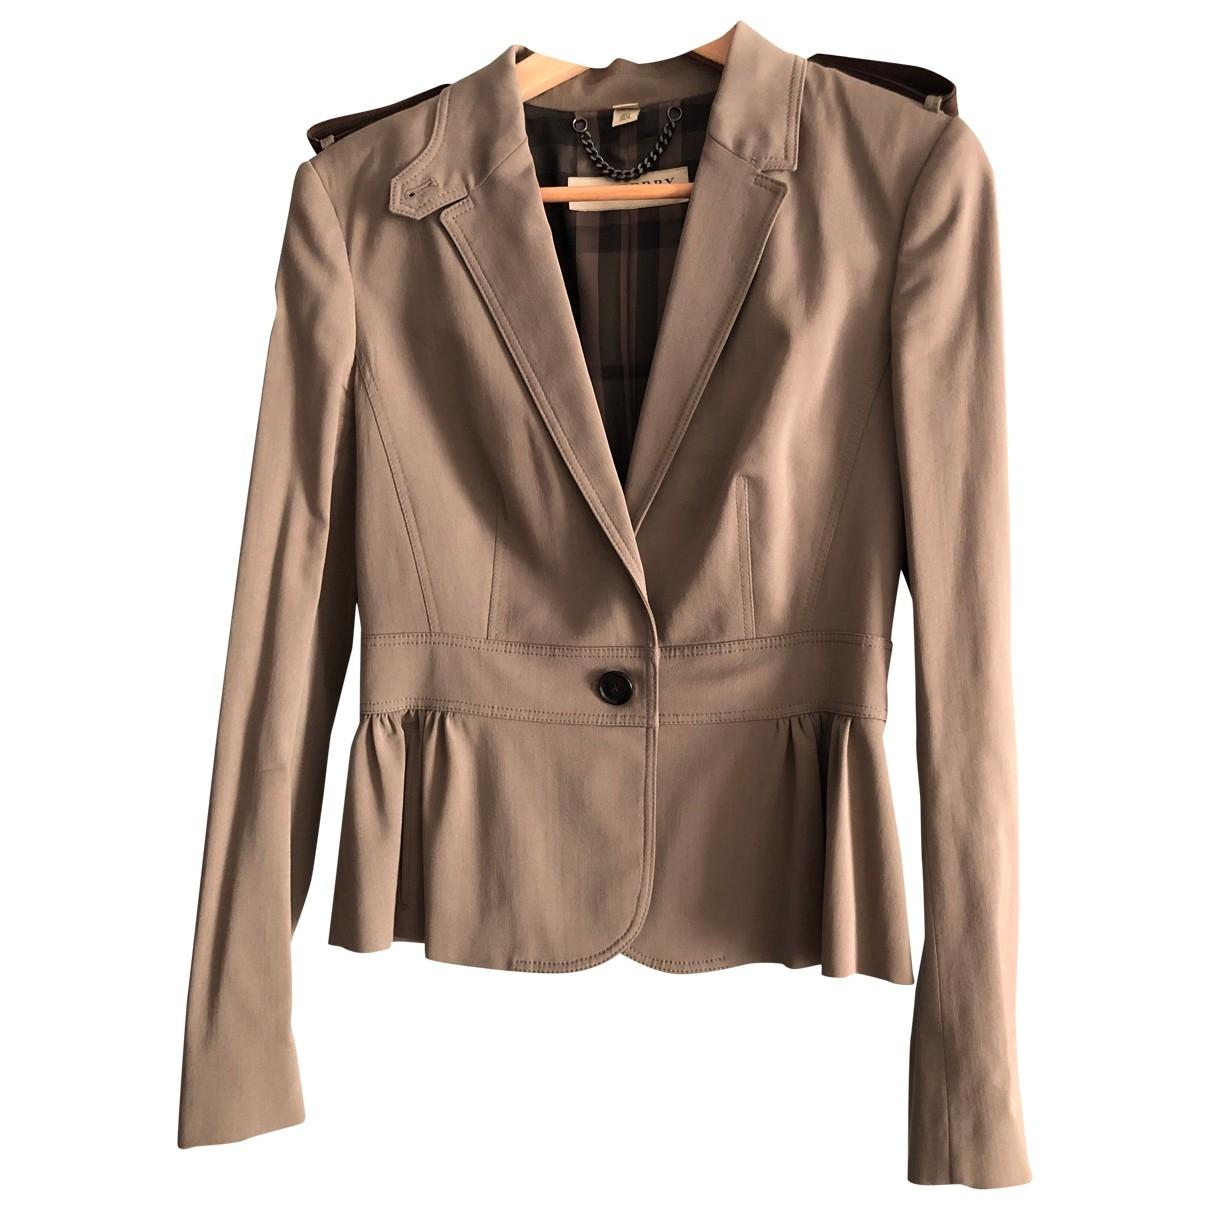 Burberry \N Beige jacket for Women 8 UK